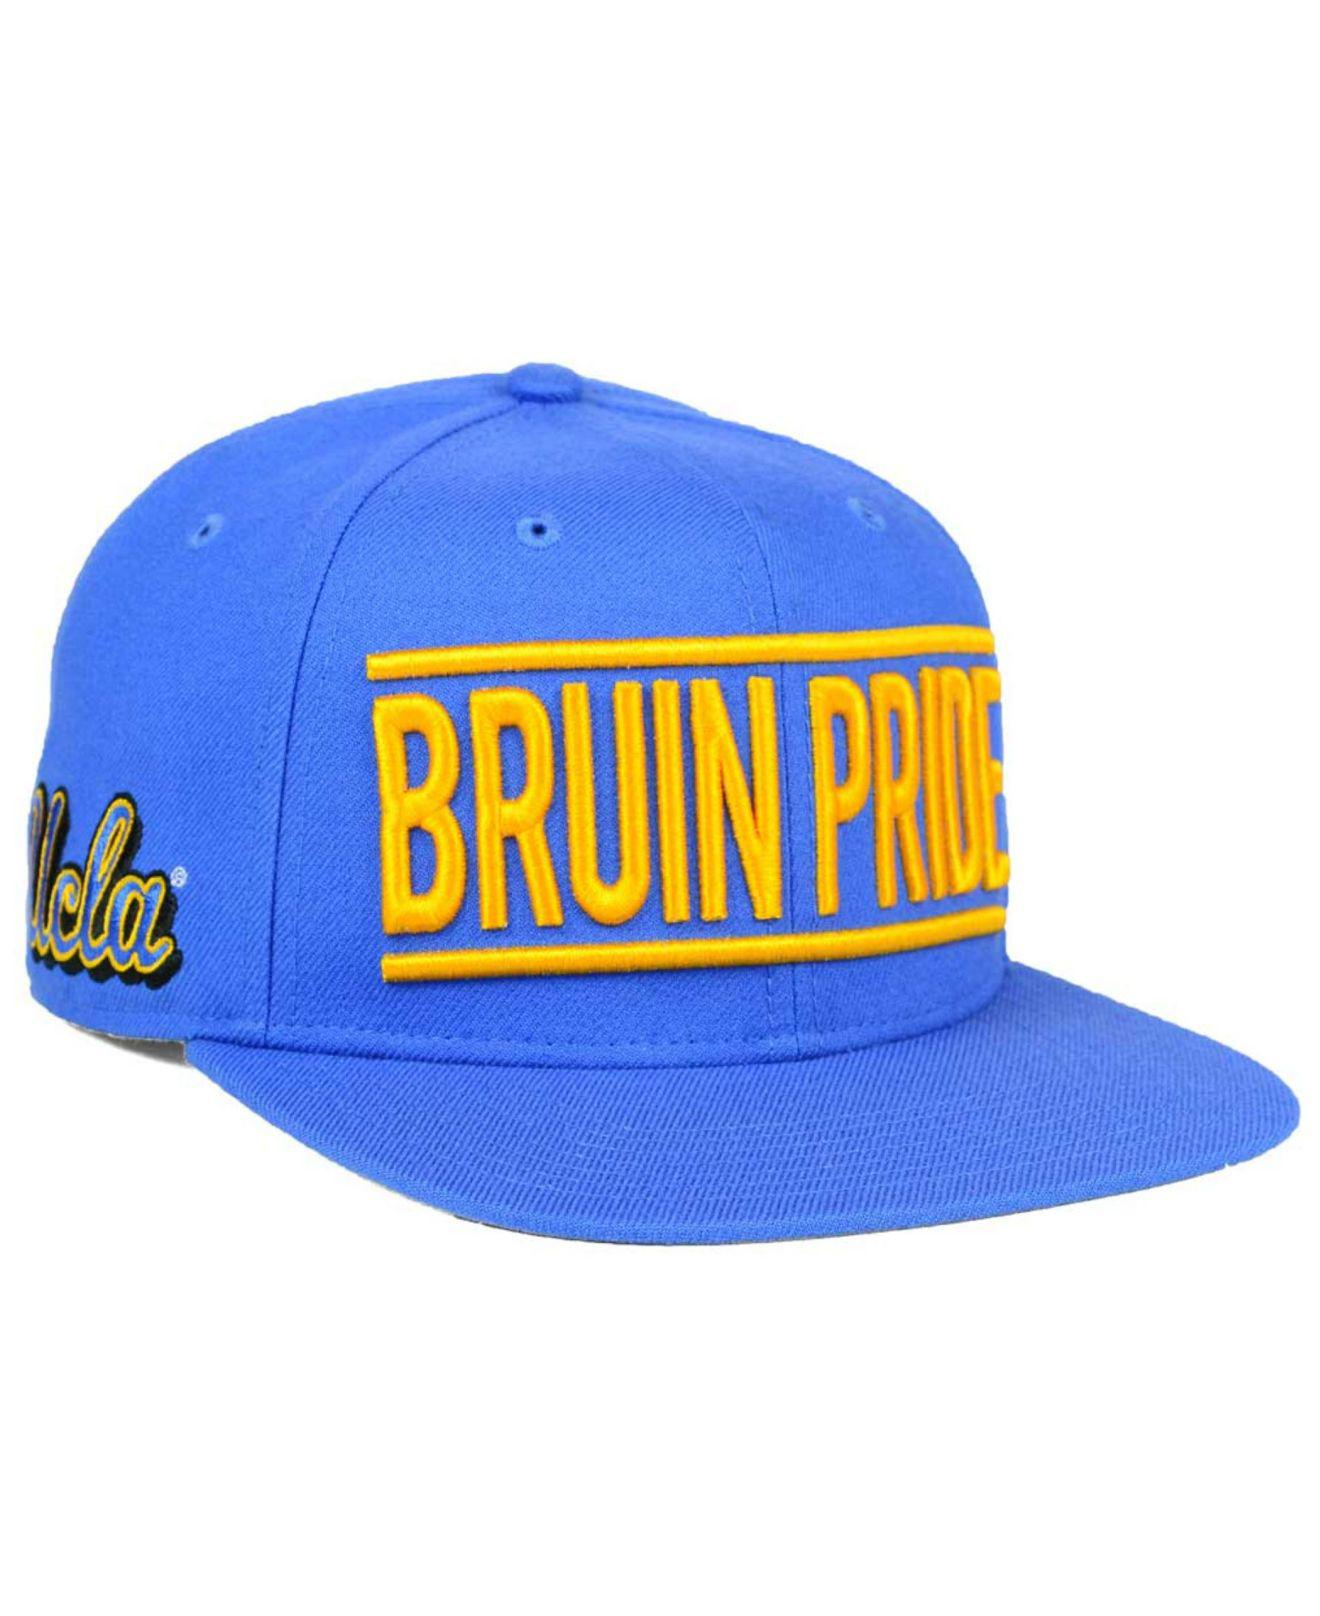 sports shoes 3766e e23e2 ... authentic lyst 47 brand ucla bruins on track snapback cap in blue for  men 253f4 da075